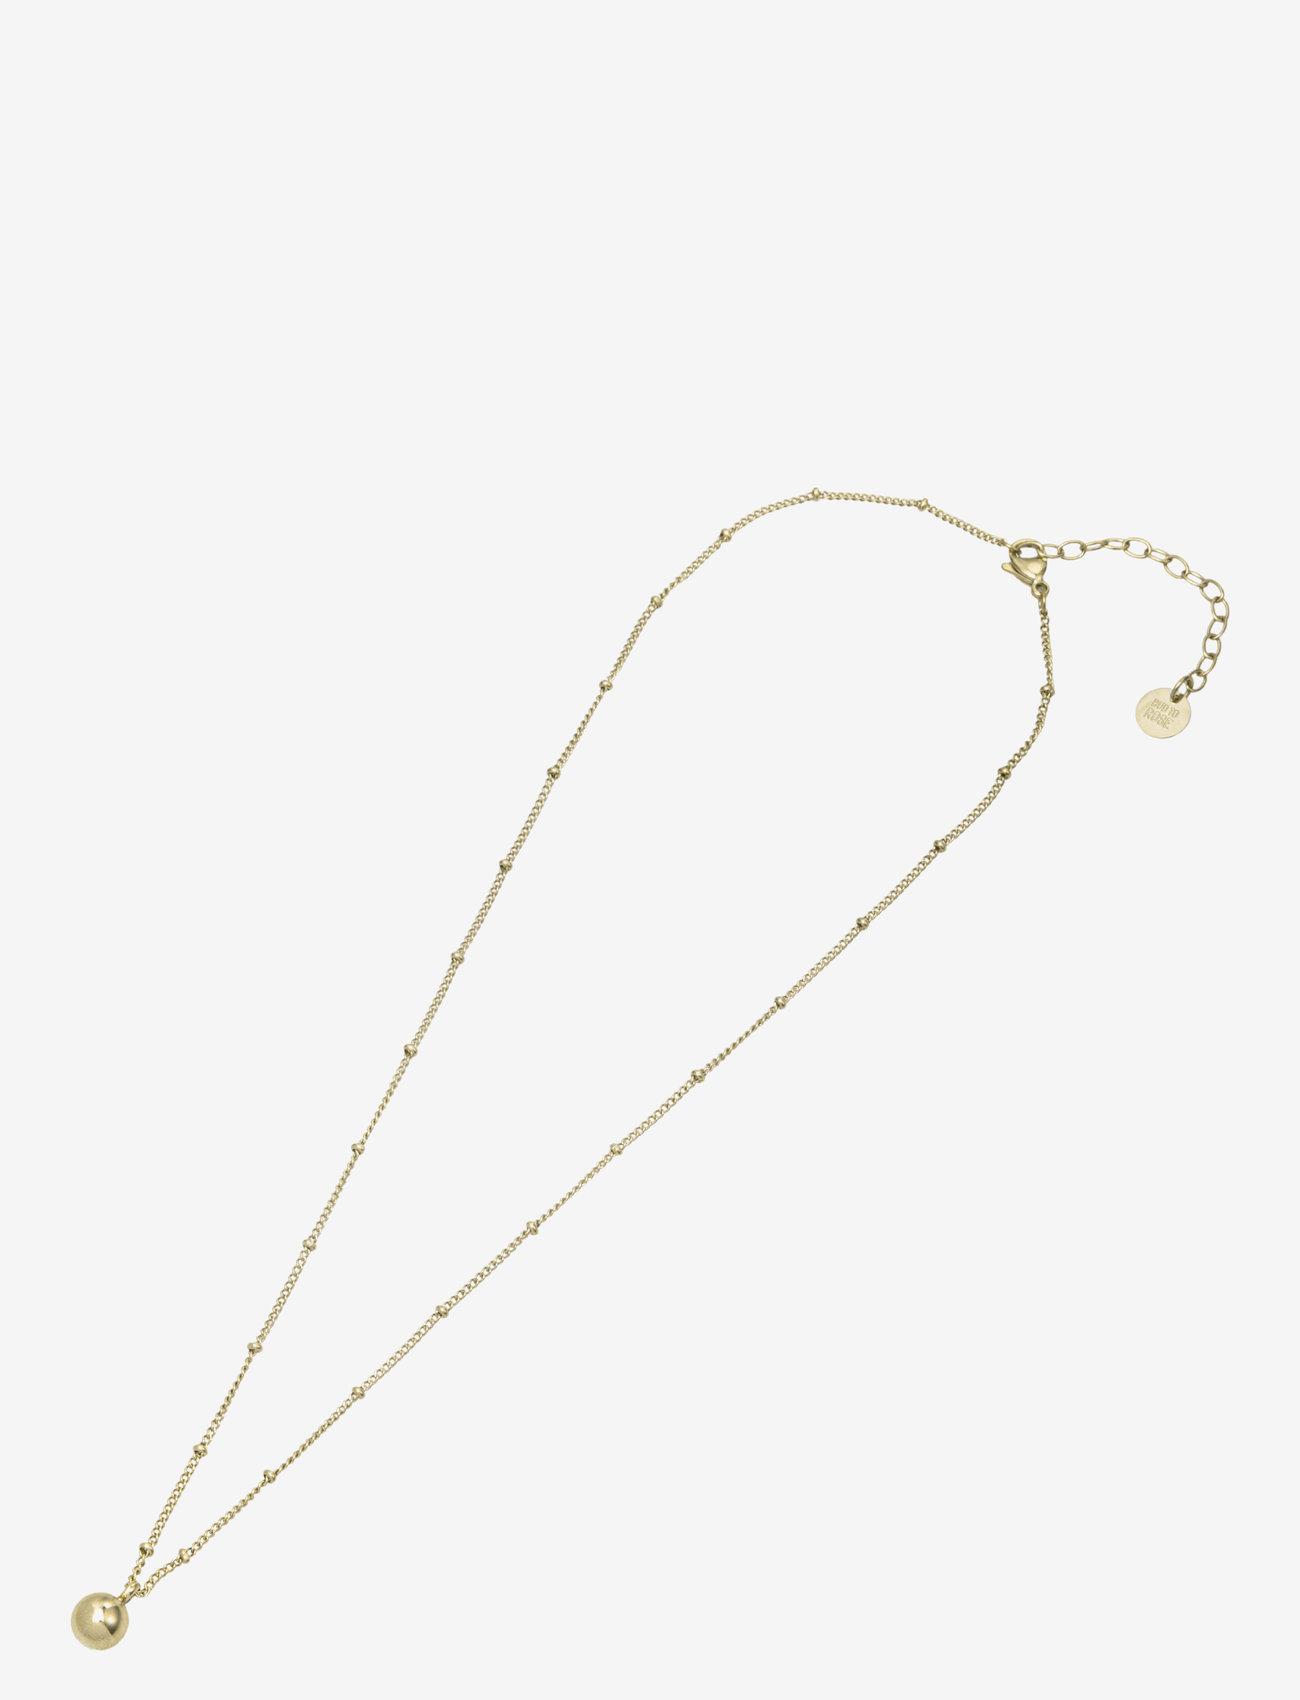 Bud to rose - Globe Short Necklace Steel - kettingen met hanger - gold - 1